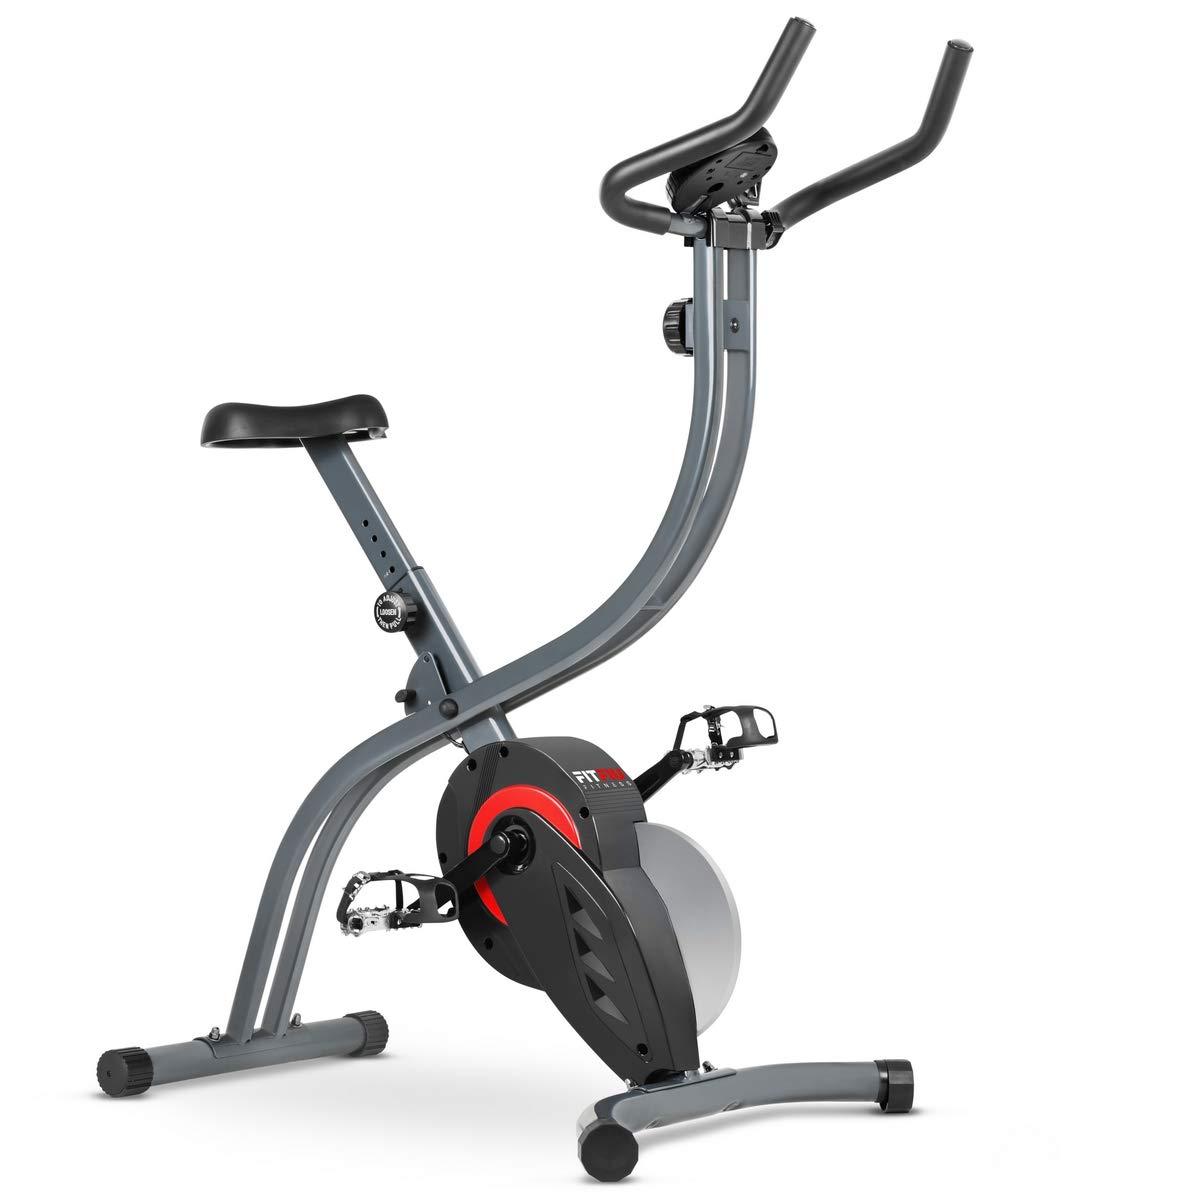 Fitfiu Besp-X7 Ergo-Heimtrainer-Fahrrad, Grau, Einheitsgrösse